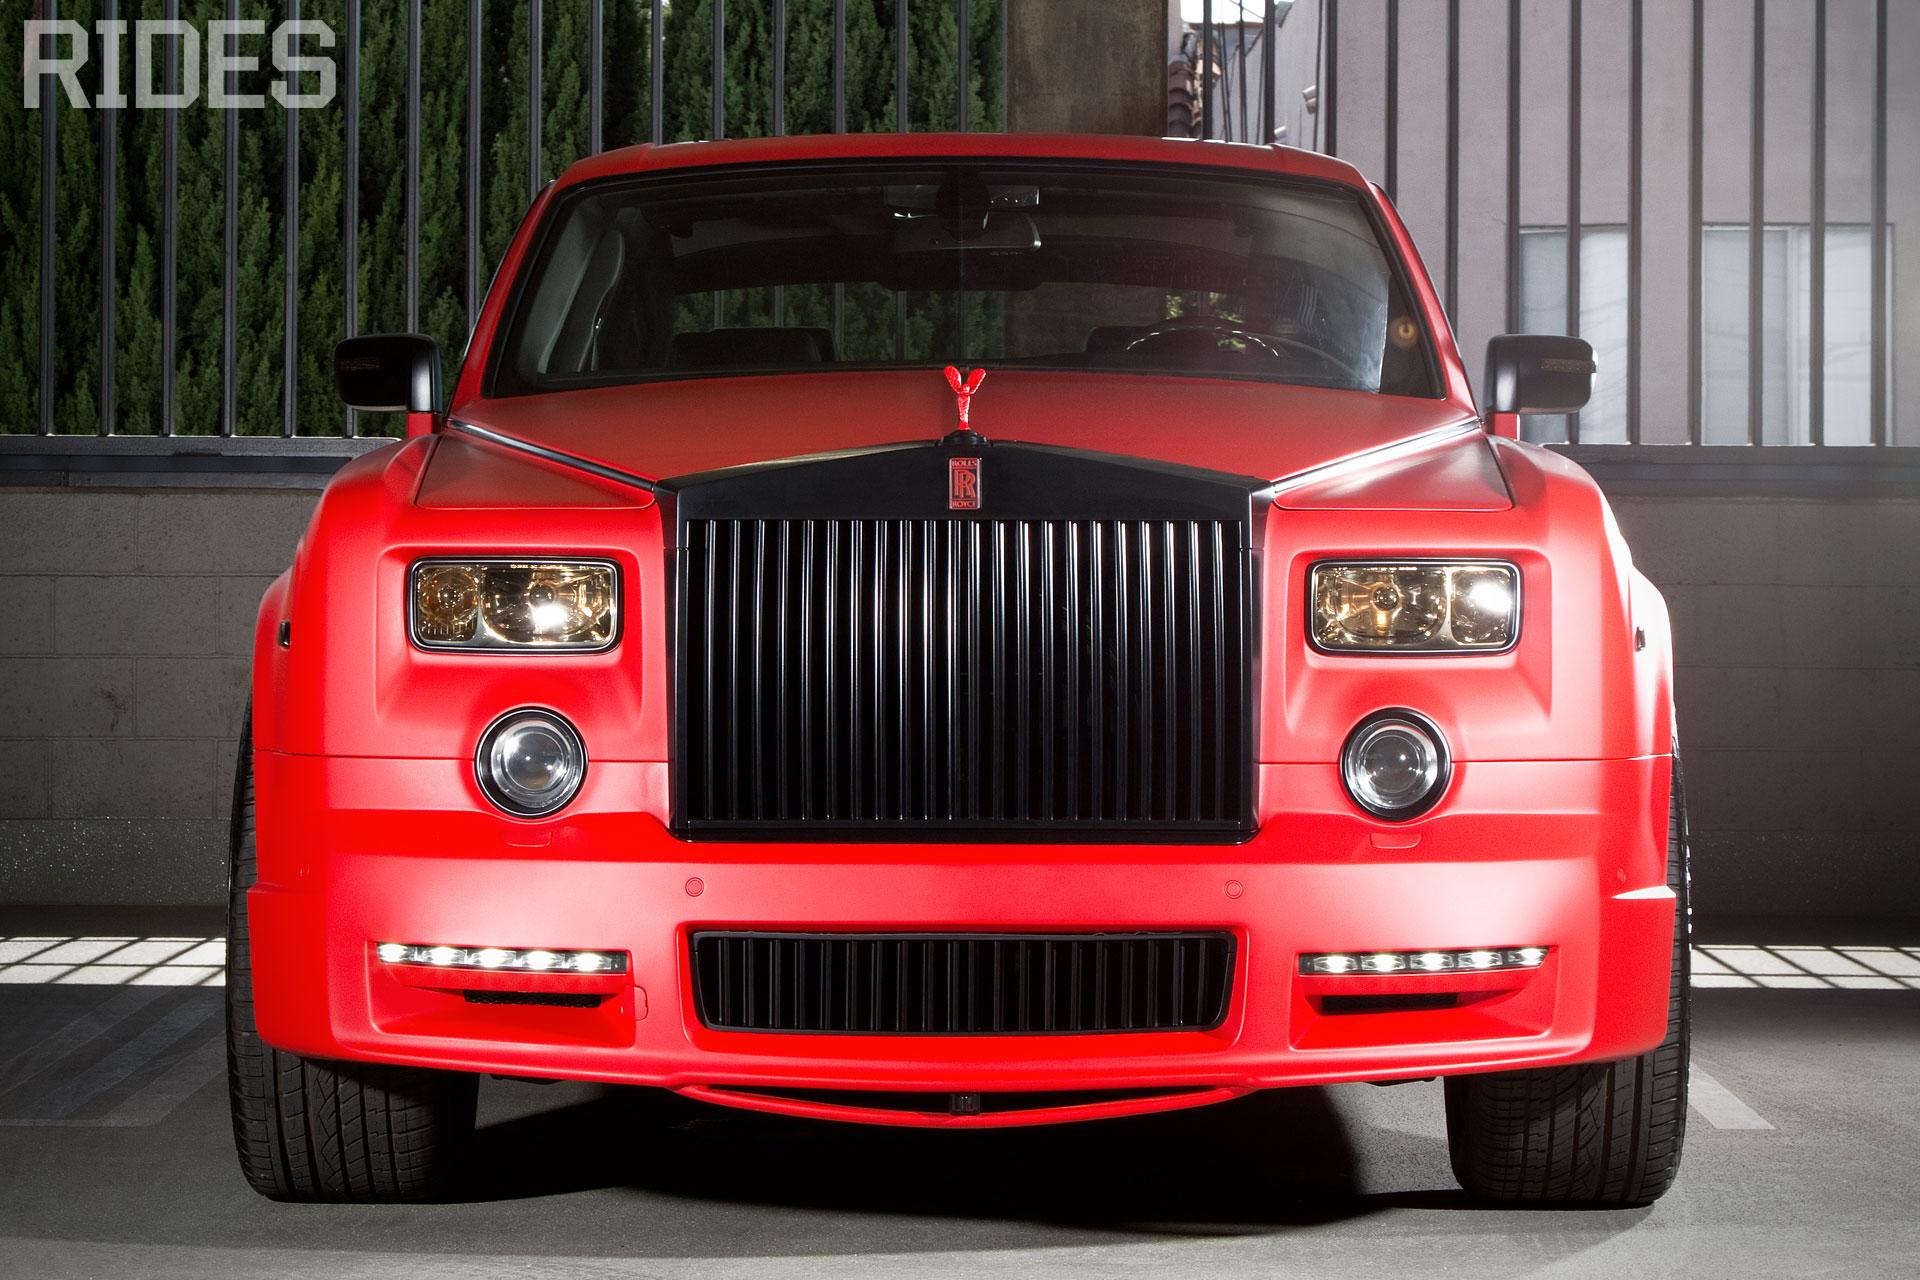 rides cars mansory platinum matte red rolls-royce rolls royce phantom